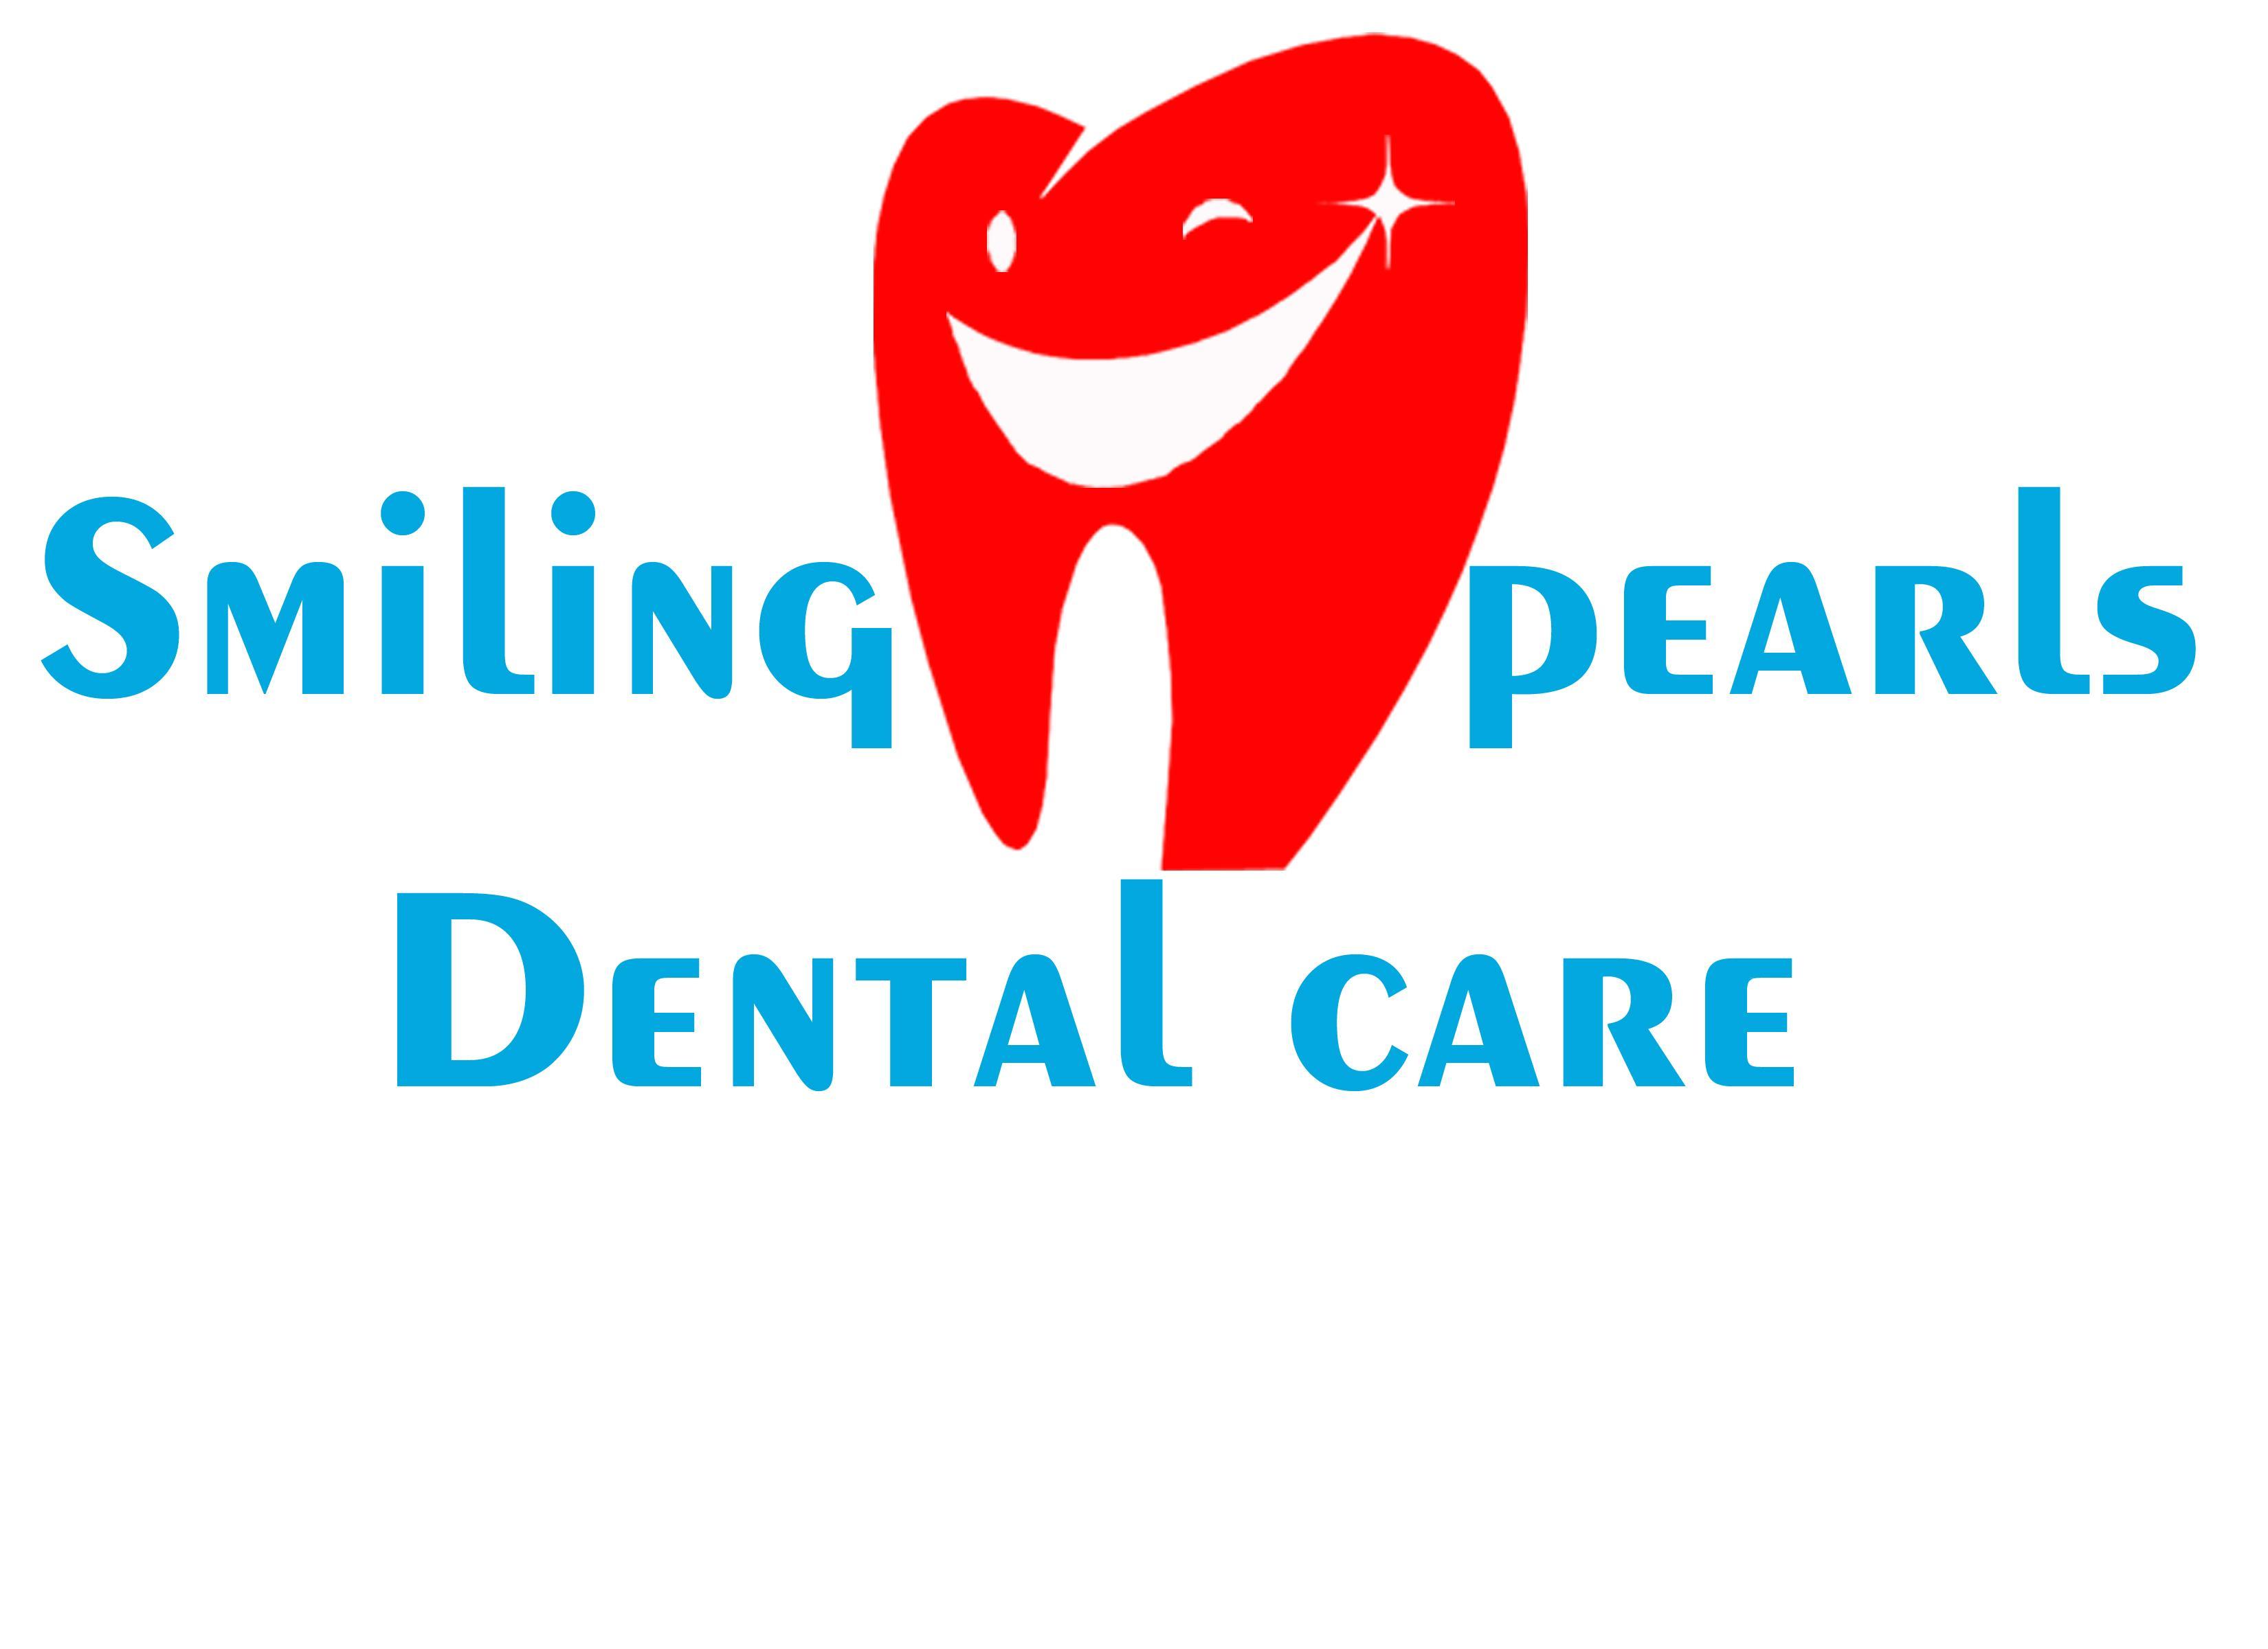 Smiling Pearls Dental Care